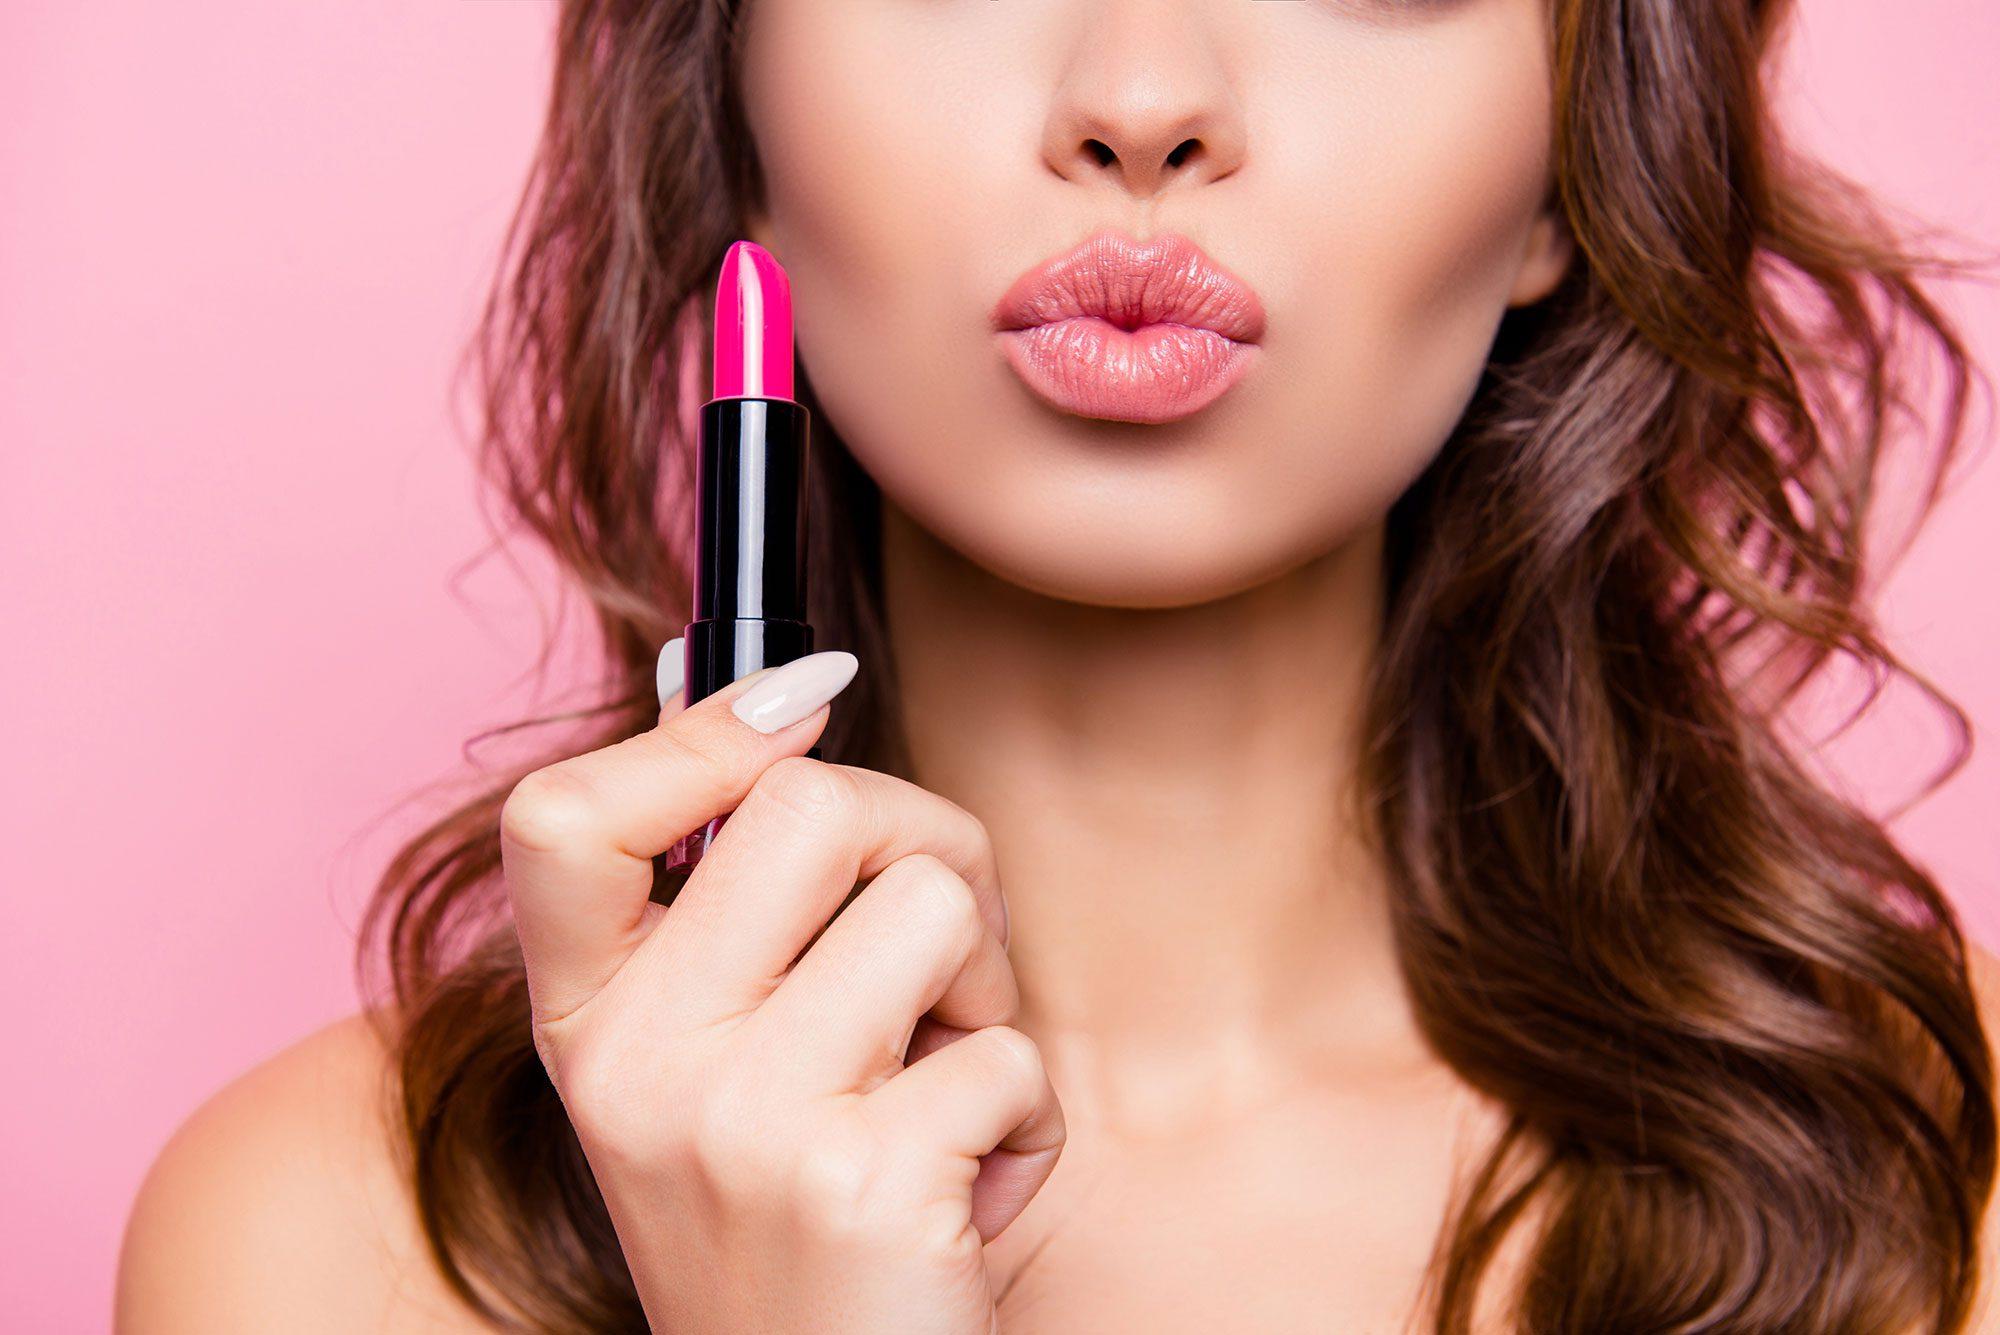 lipsticks and cosmetics